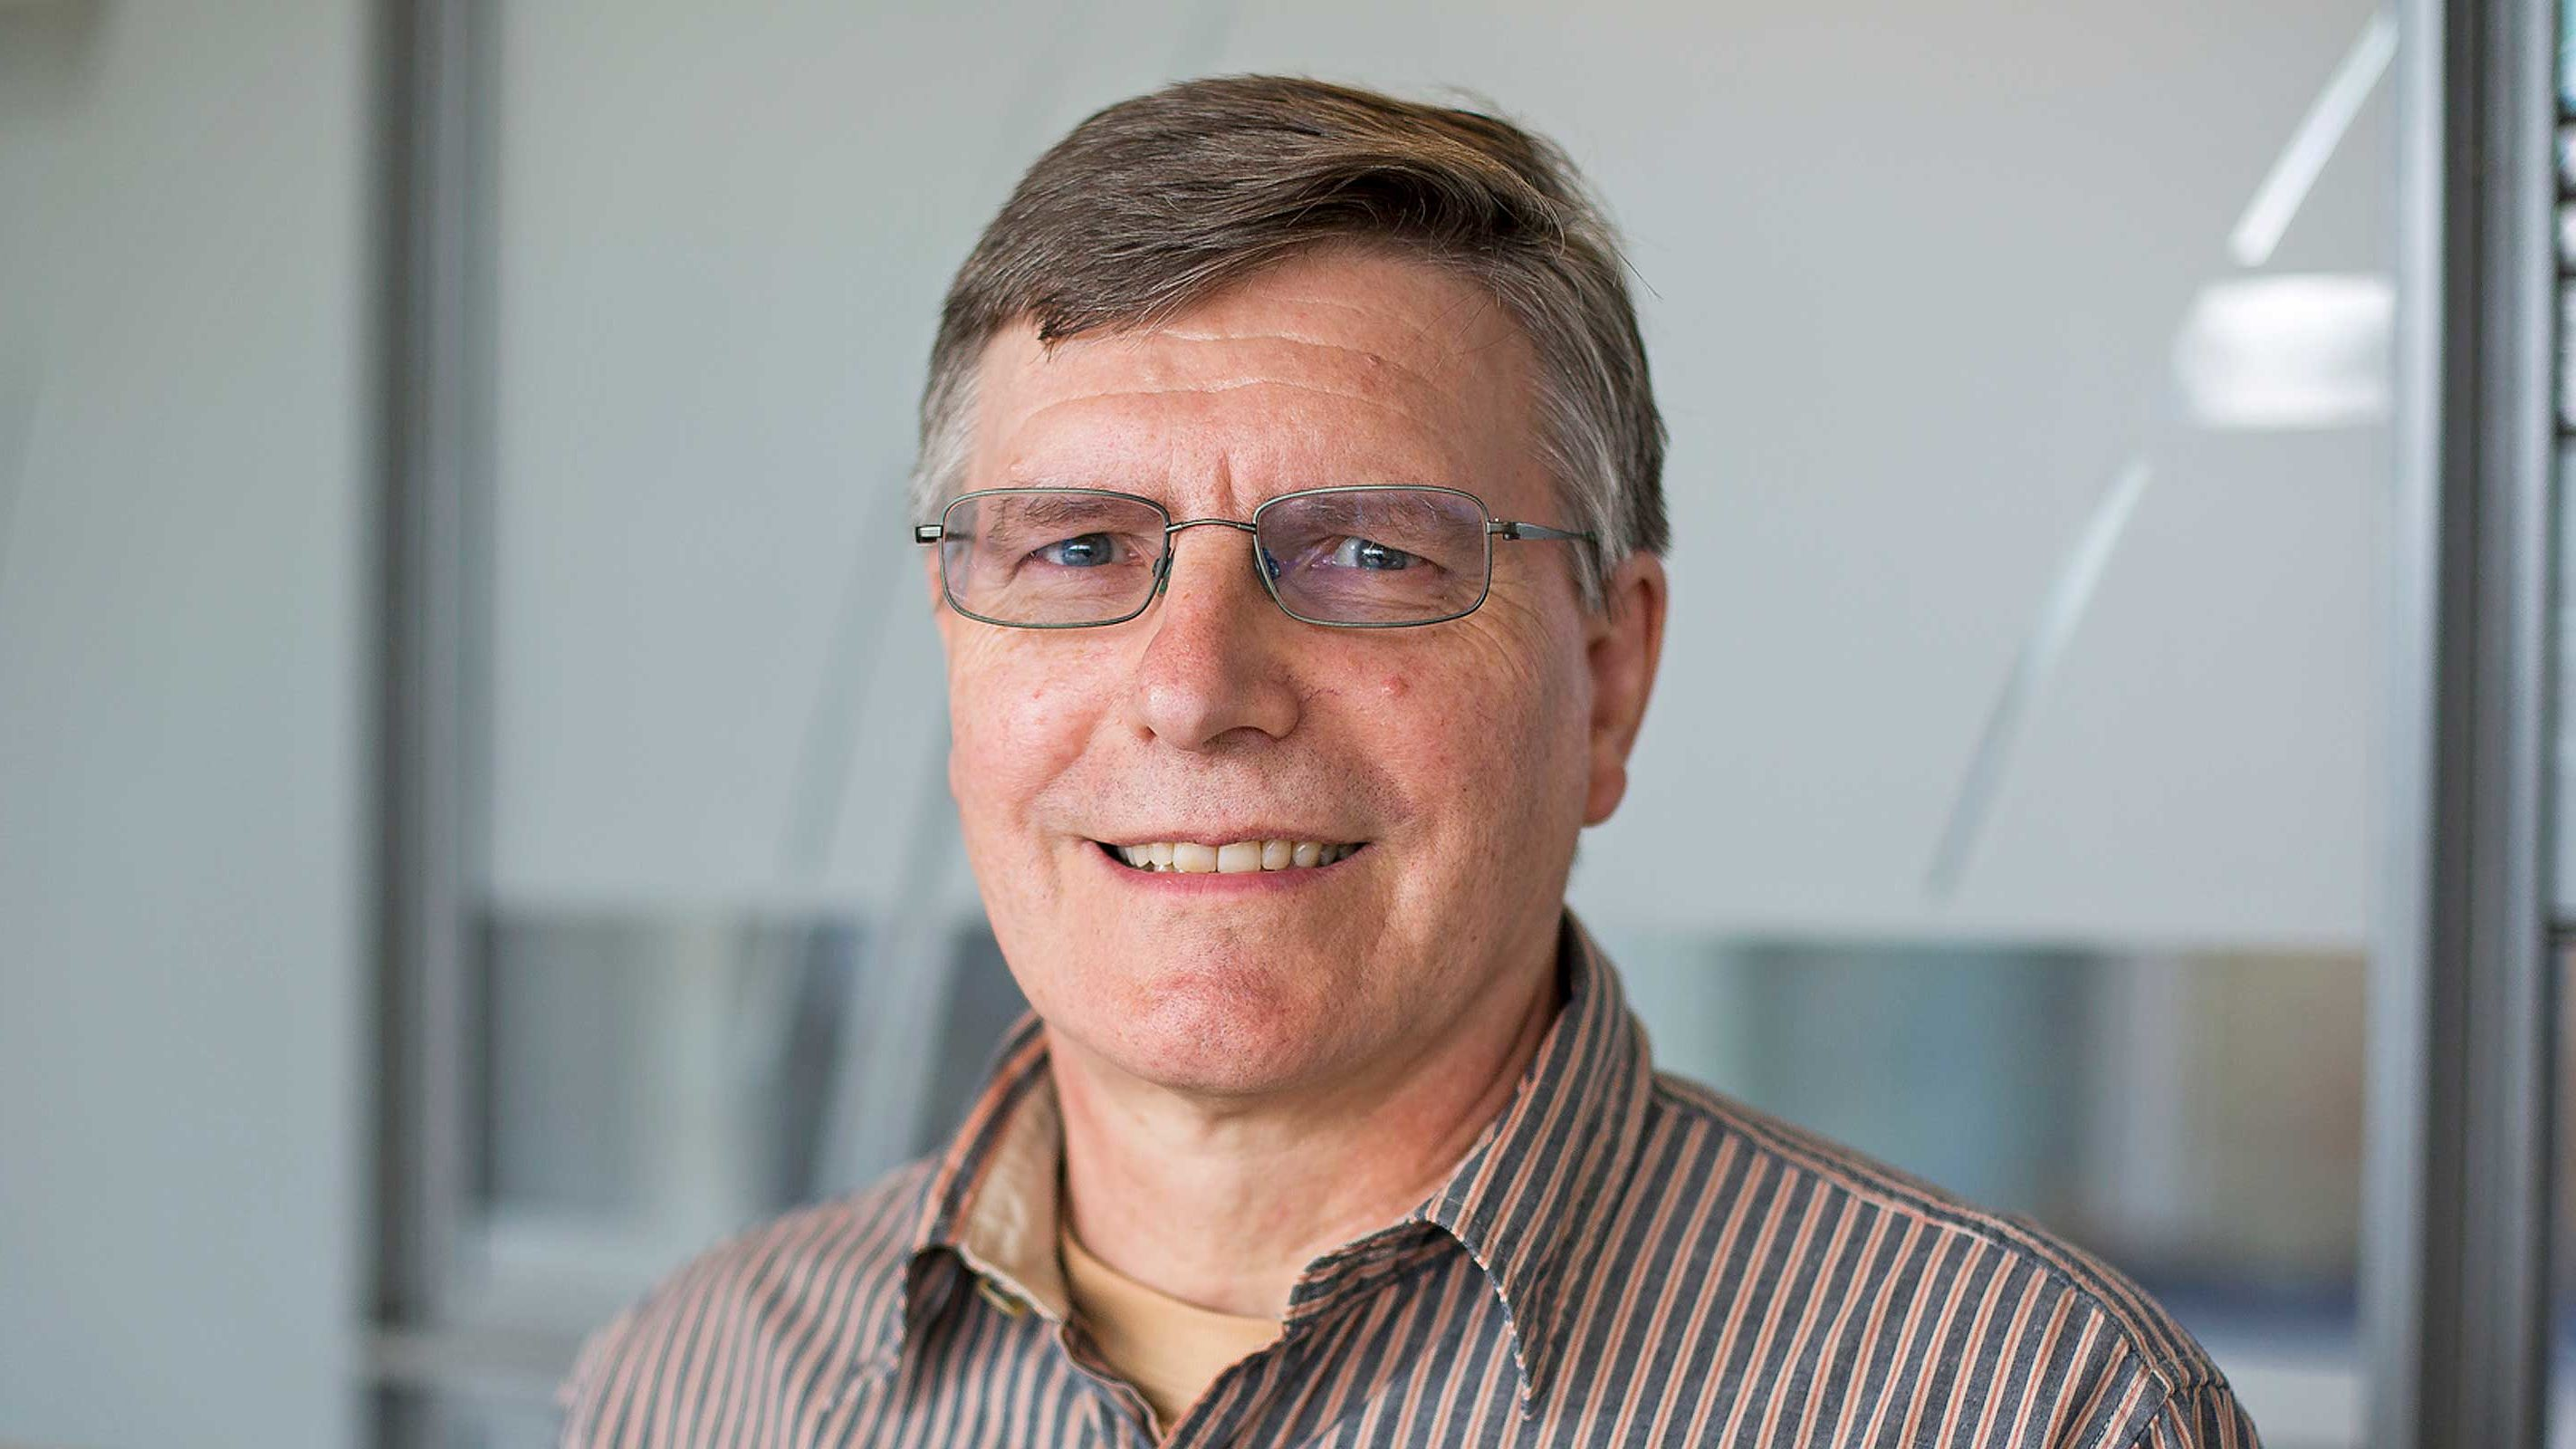 Johannes Schwank elected AIChE Fellow